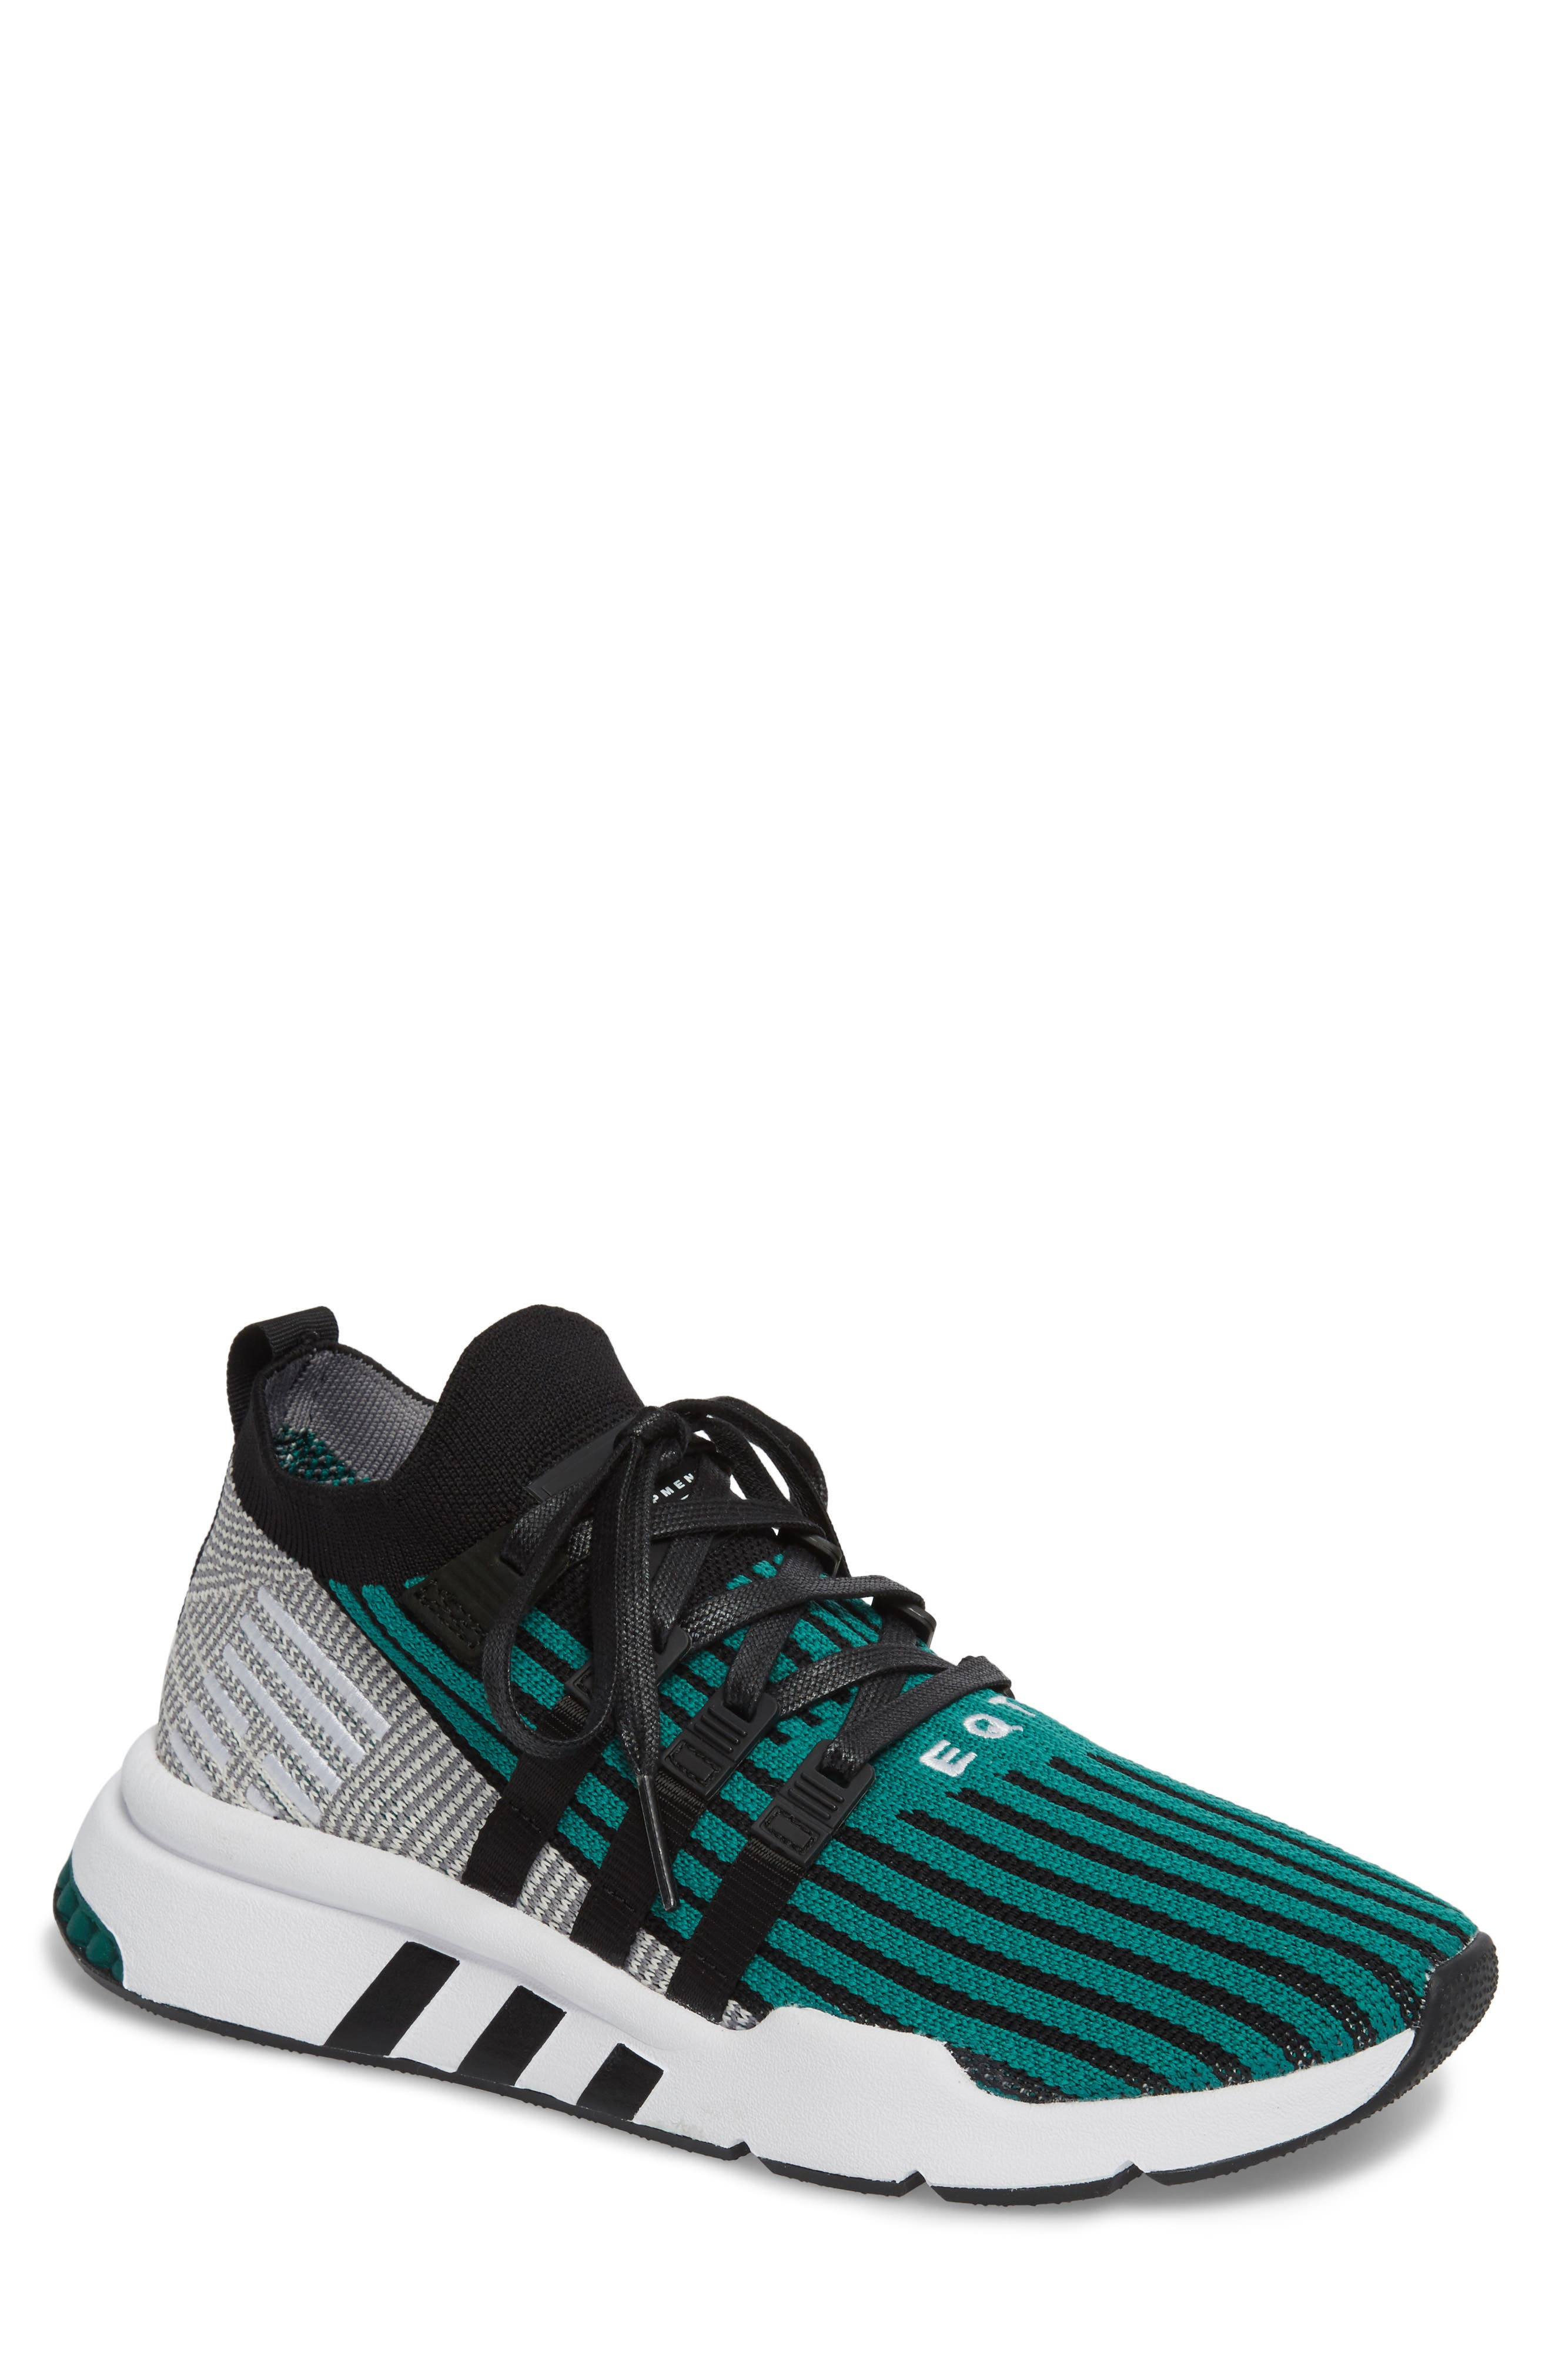 adidas EQT Support Mid ADV PrimeKnit Sneaker (Men)